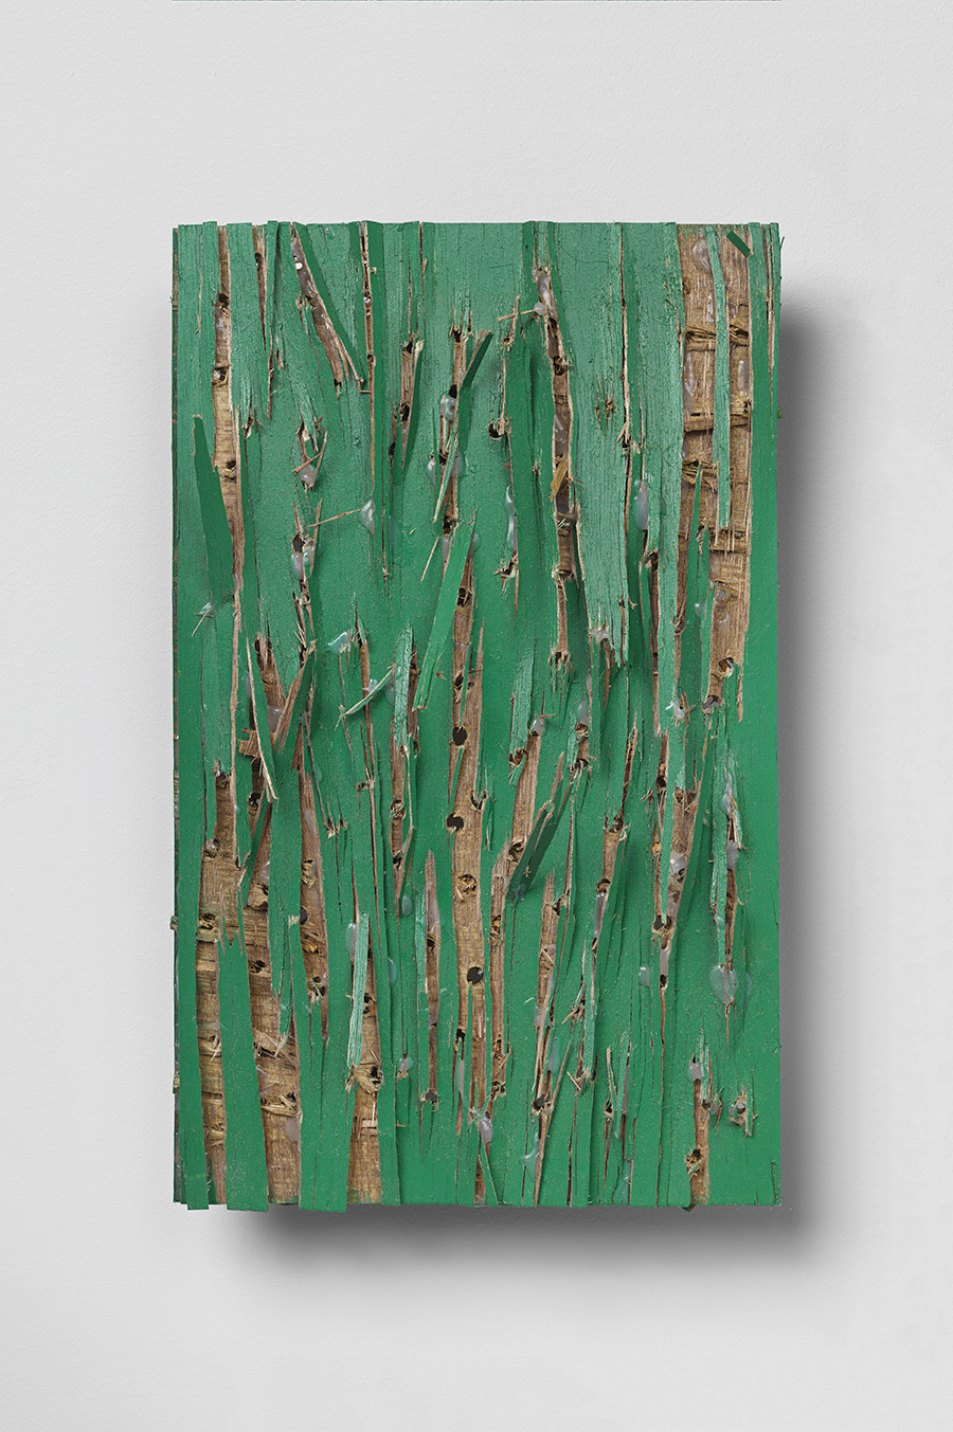 Kishio Suga,<em>Origins of Scenery and Site</em>, 2011, wood, paint, 33 × 20,1 × 8,8 cm - Mendes Wood DM